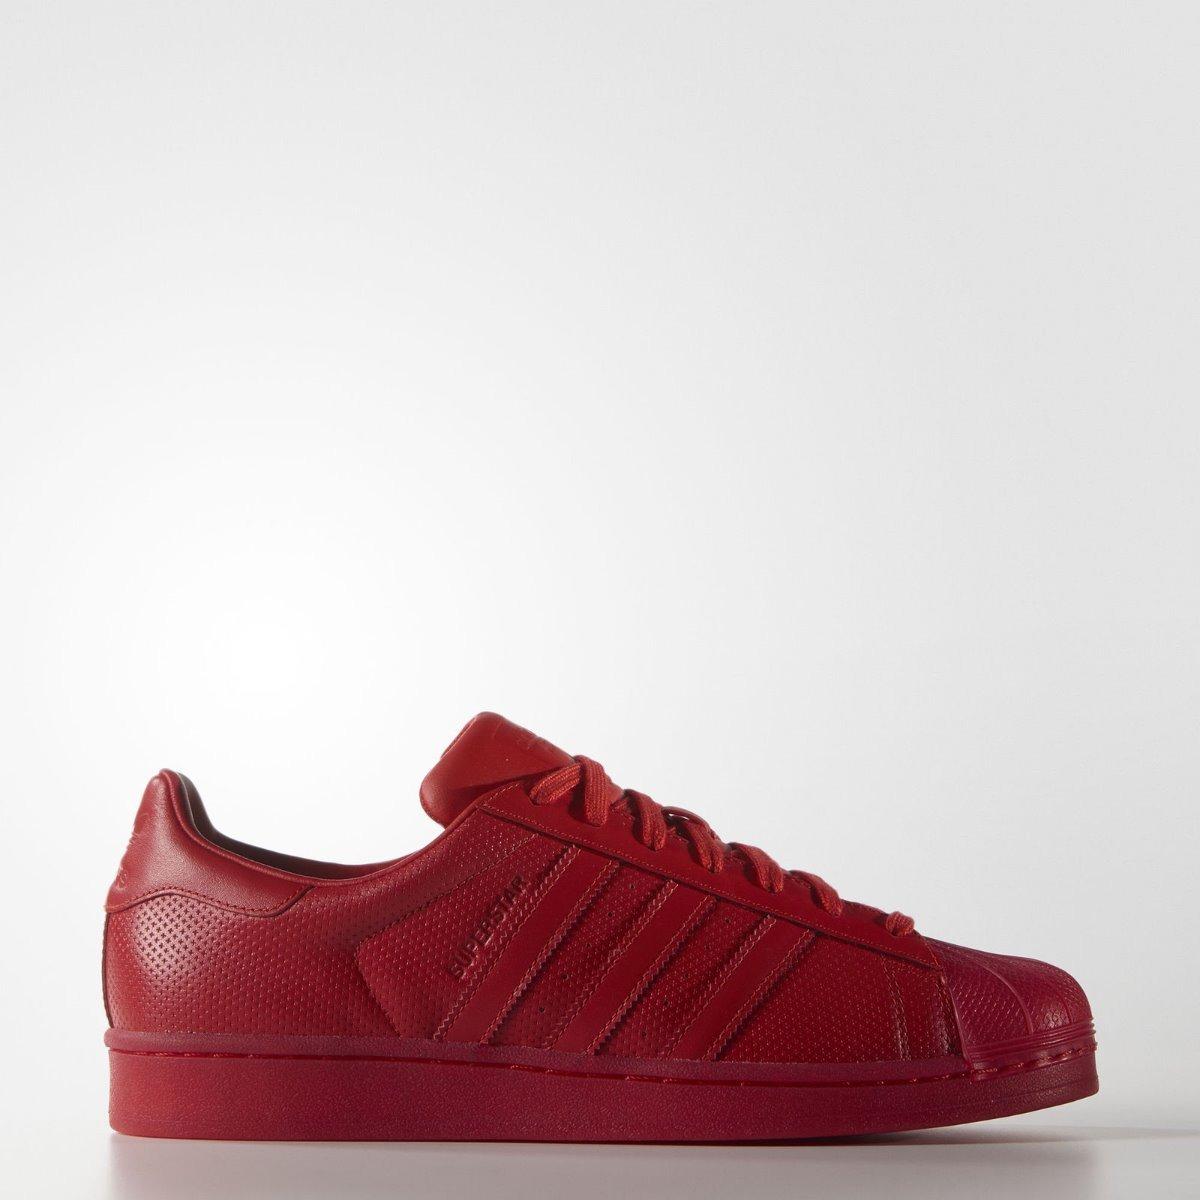 adidas Superstar Rojas + Envio Gratis